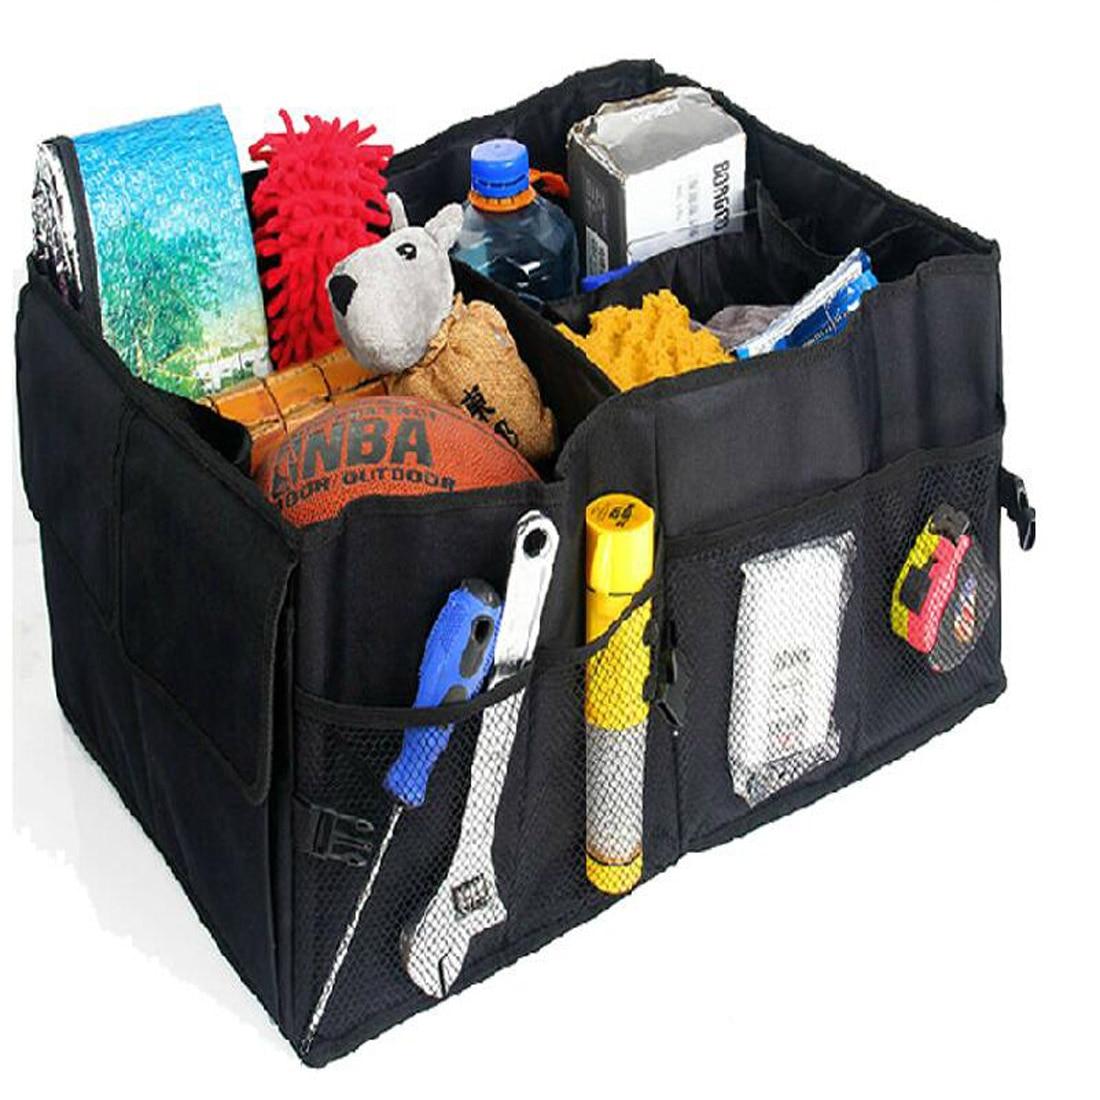 1x car trunk storage bag multifunction racks folding nets car trunk bag organizer bag toolbox. Black Bedroom Furniture Sets. Home Design Ideas